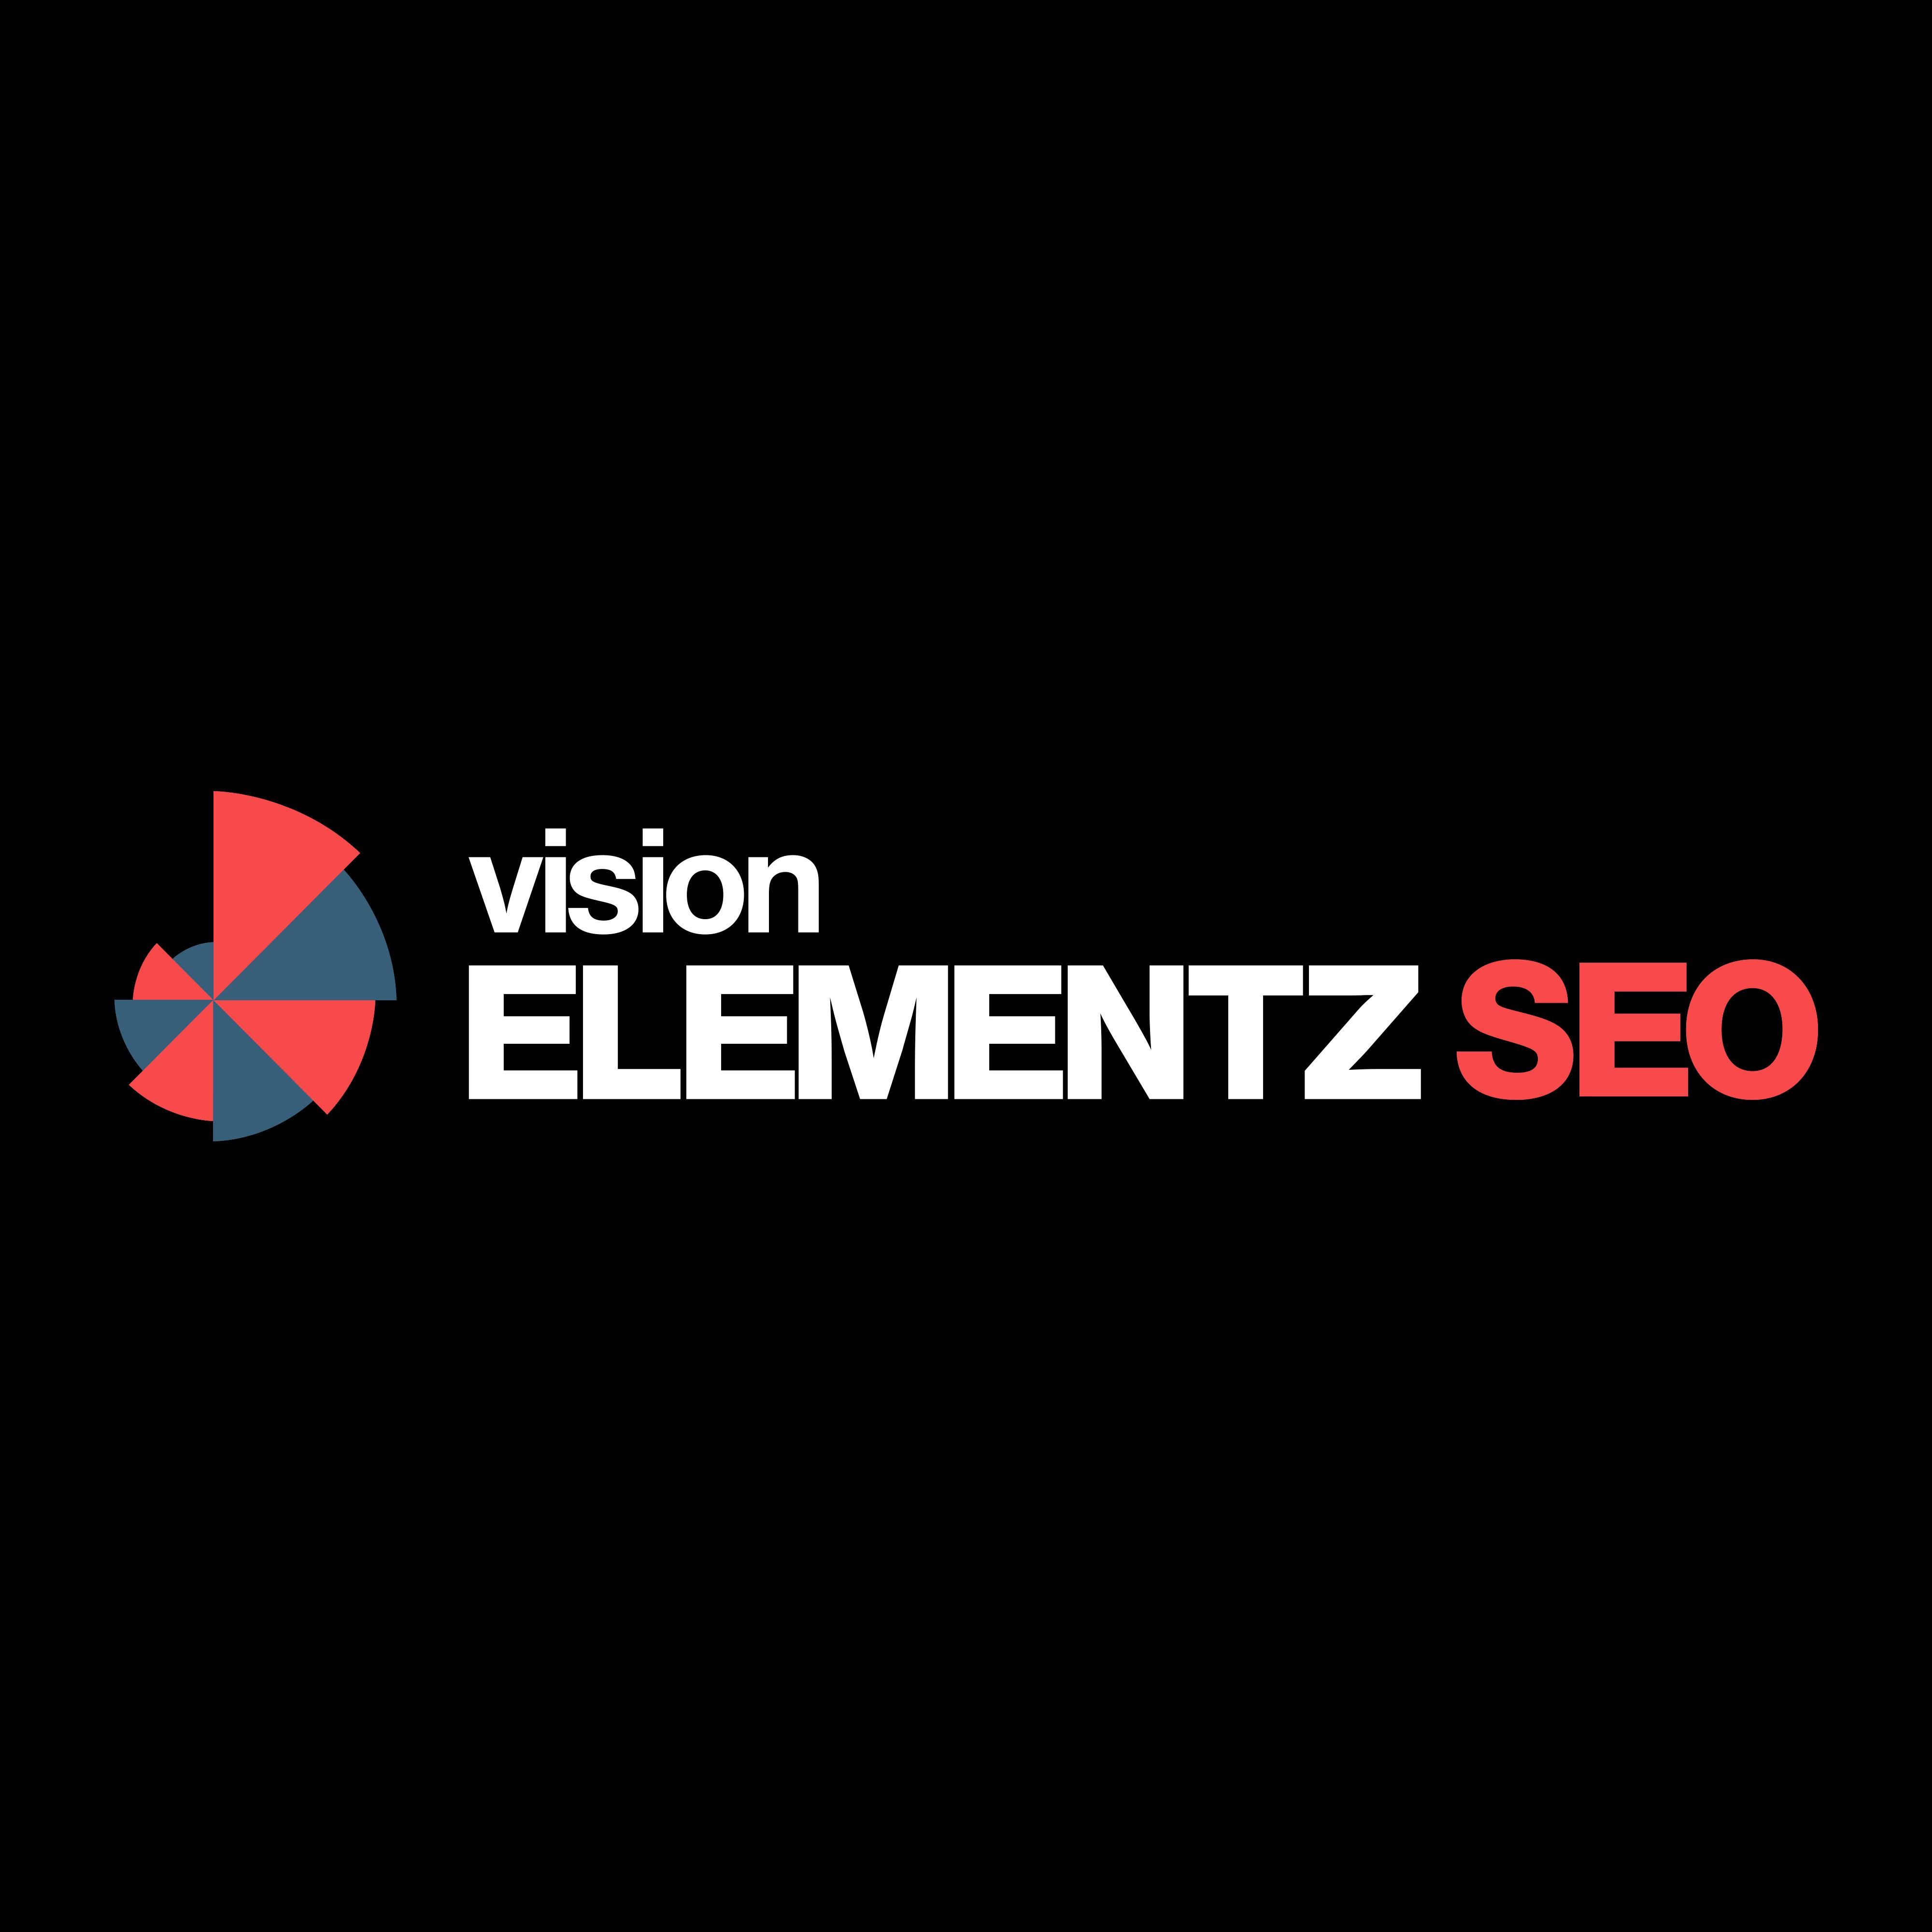 Vision Elementz SEO